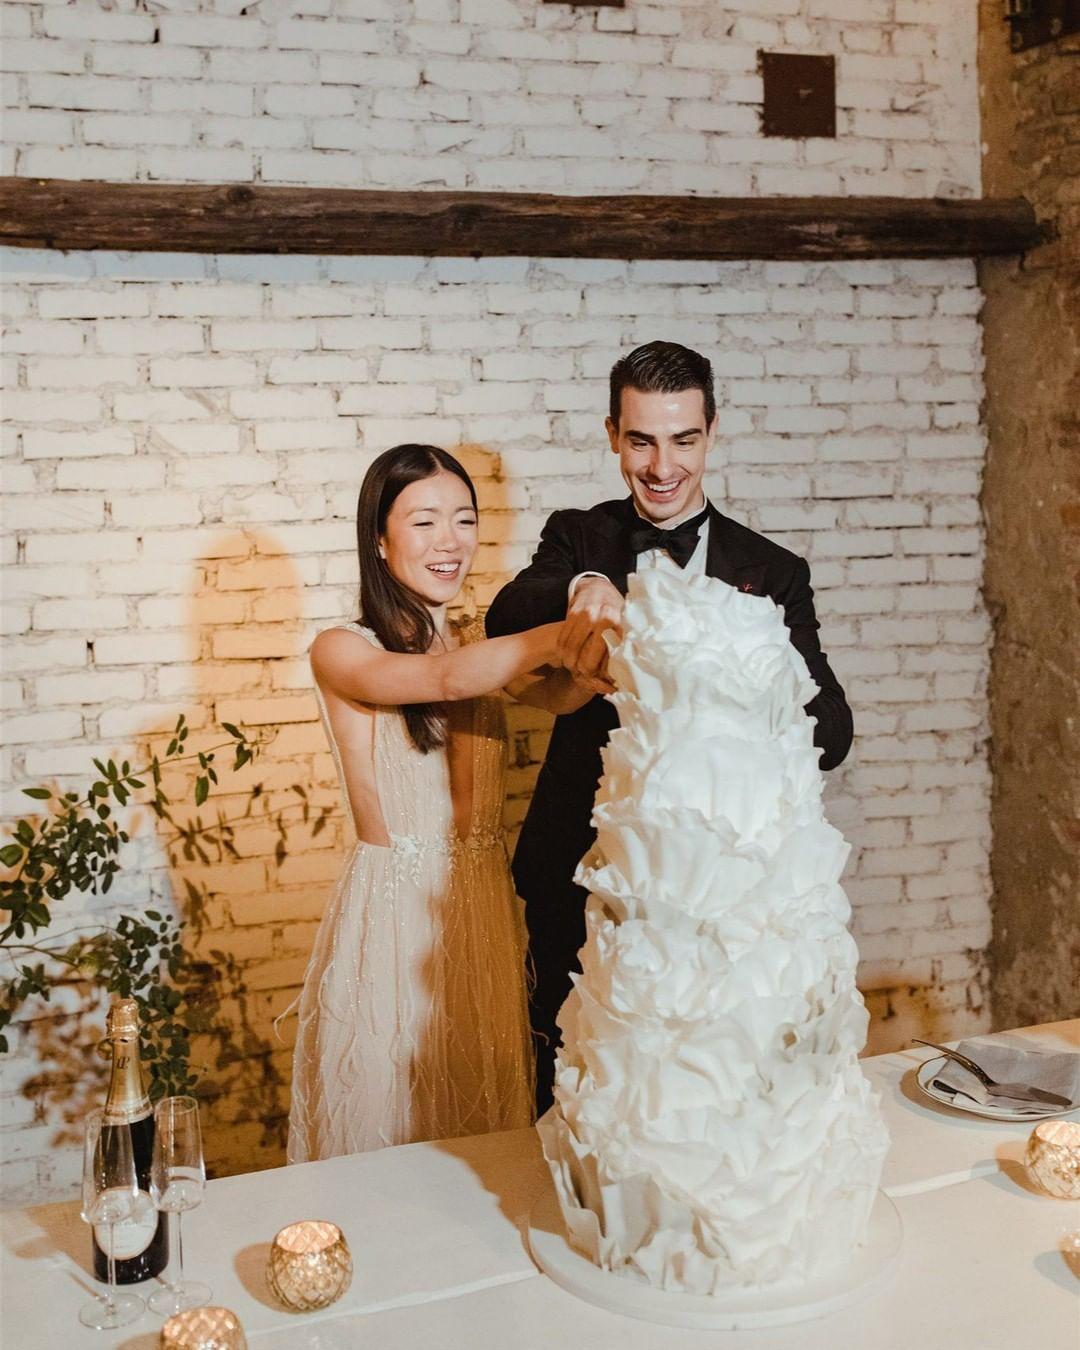 Vogue Weddings On Instagram Benita Chan Thebigchan And Grant Anderson S Thegranderson Wedding Cake Was As Dreamy As Their W In 2020 Vogue Wedding Wedding Bride